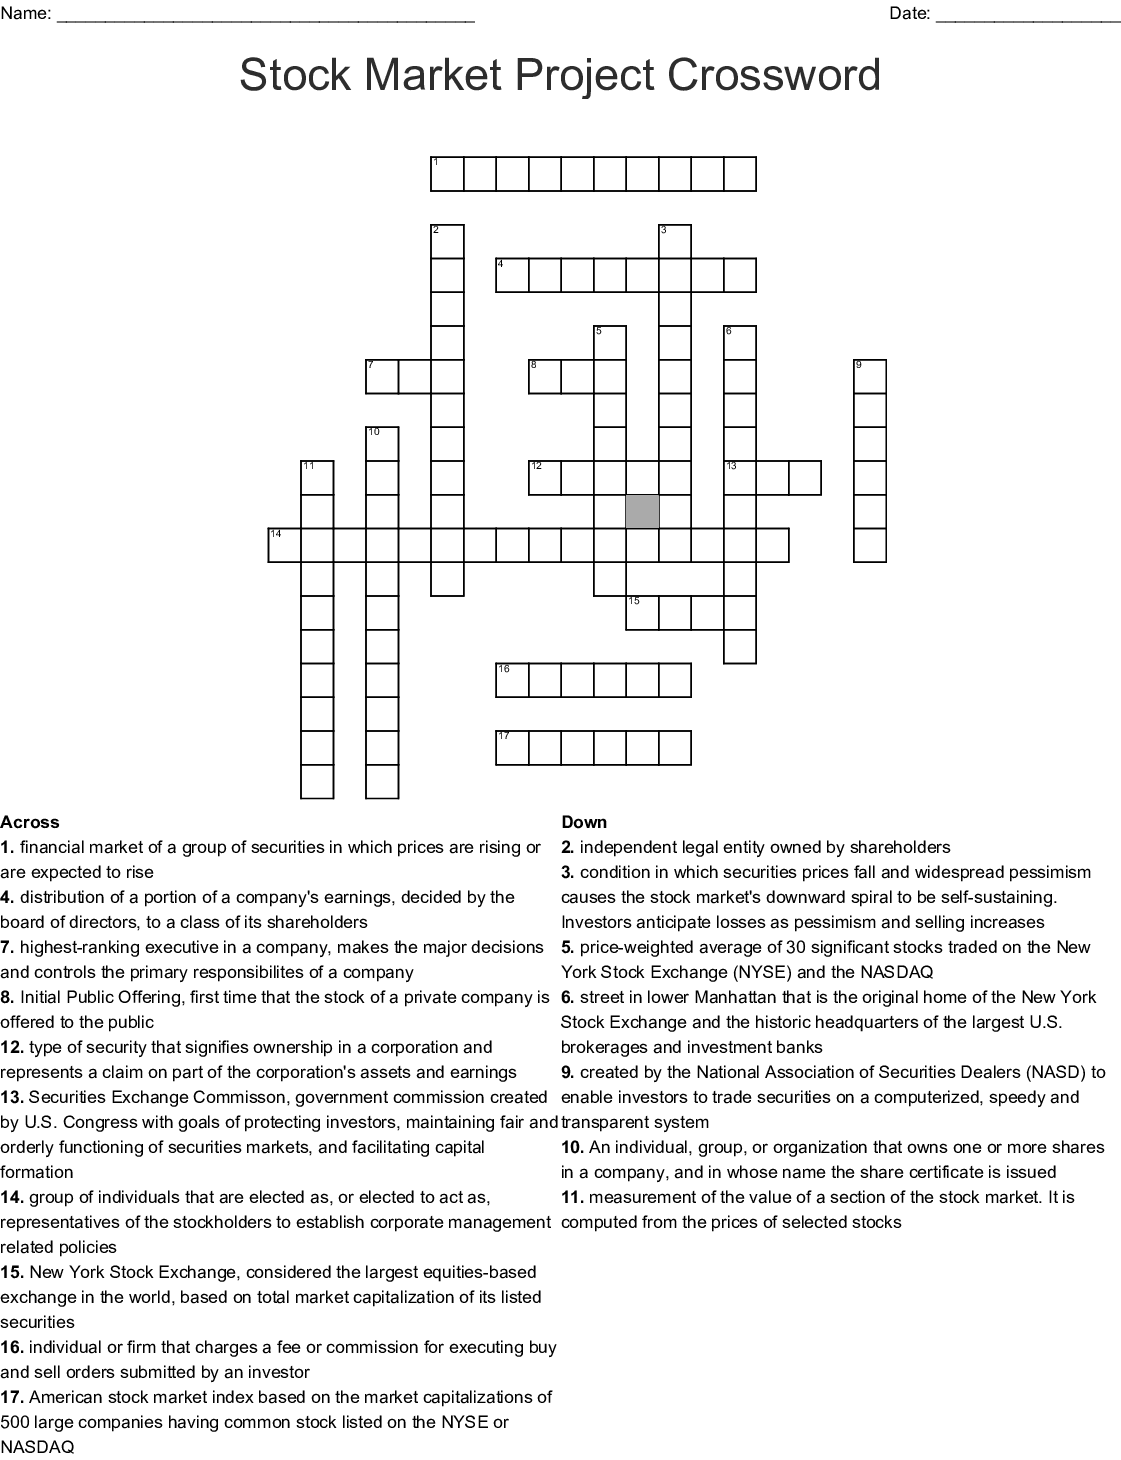 Stock Market Puzzle Crossword